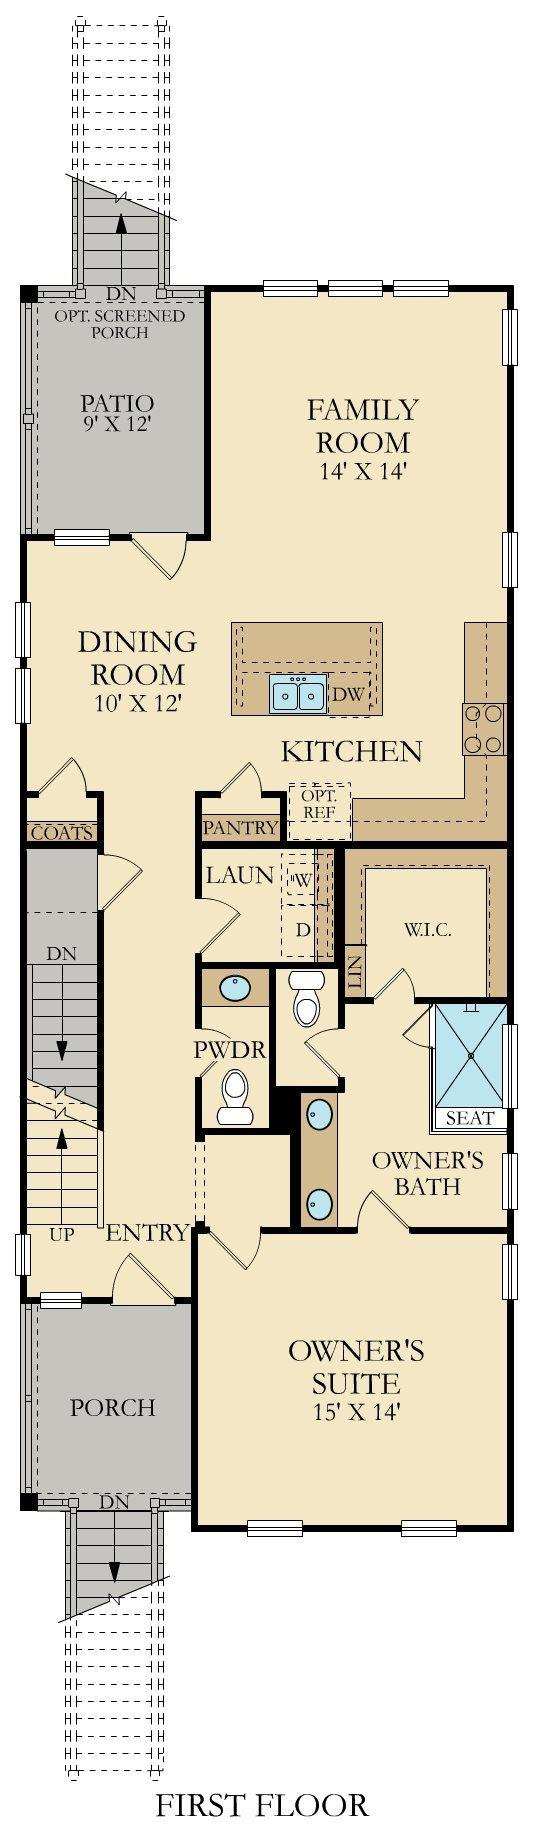 Stonoview Homes For Sale - 2753 Mcfadden, Johns Island, SC - 1